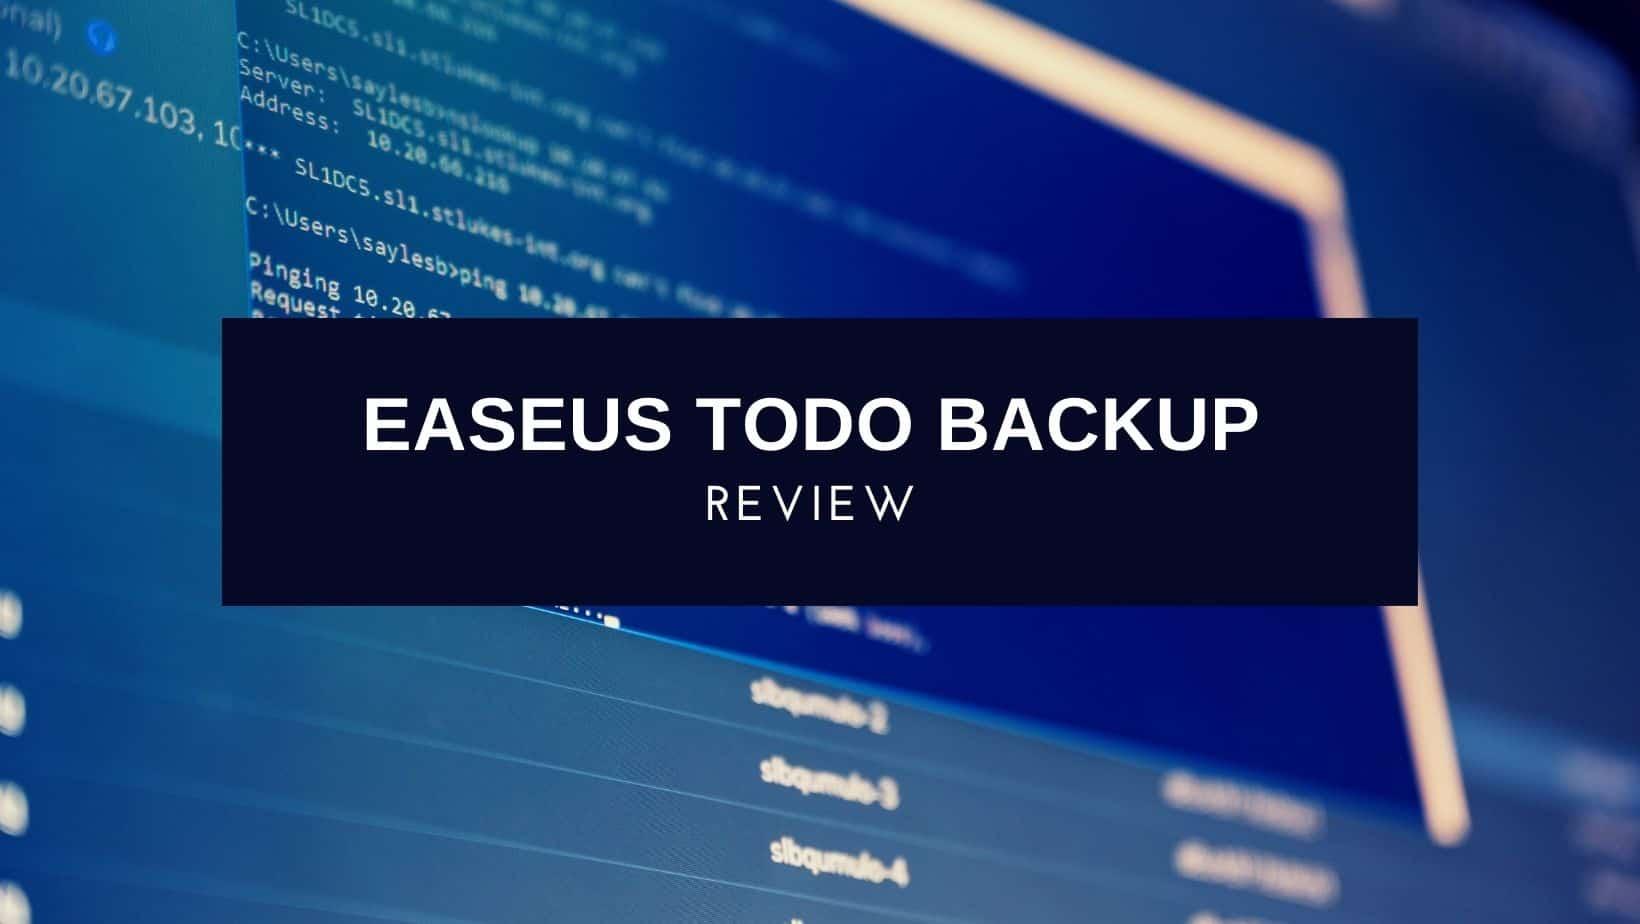 EaseUS Todo Backup Review